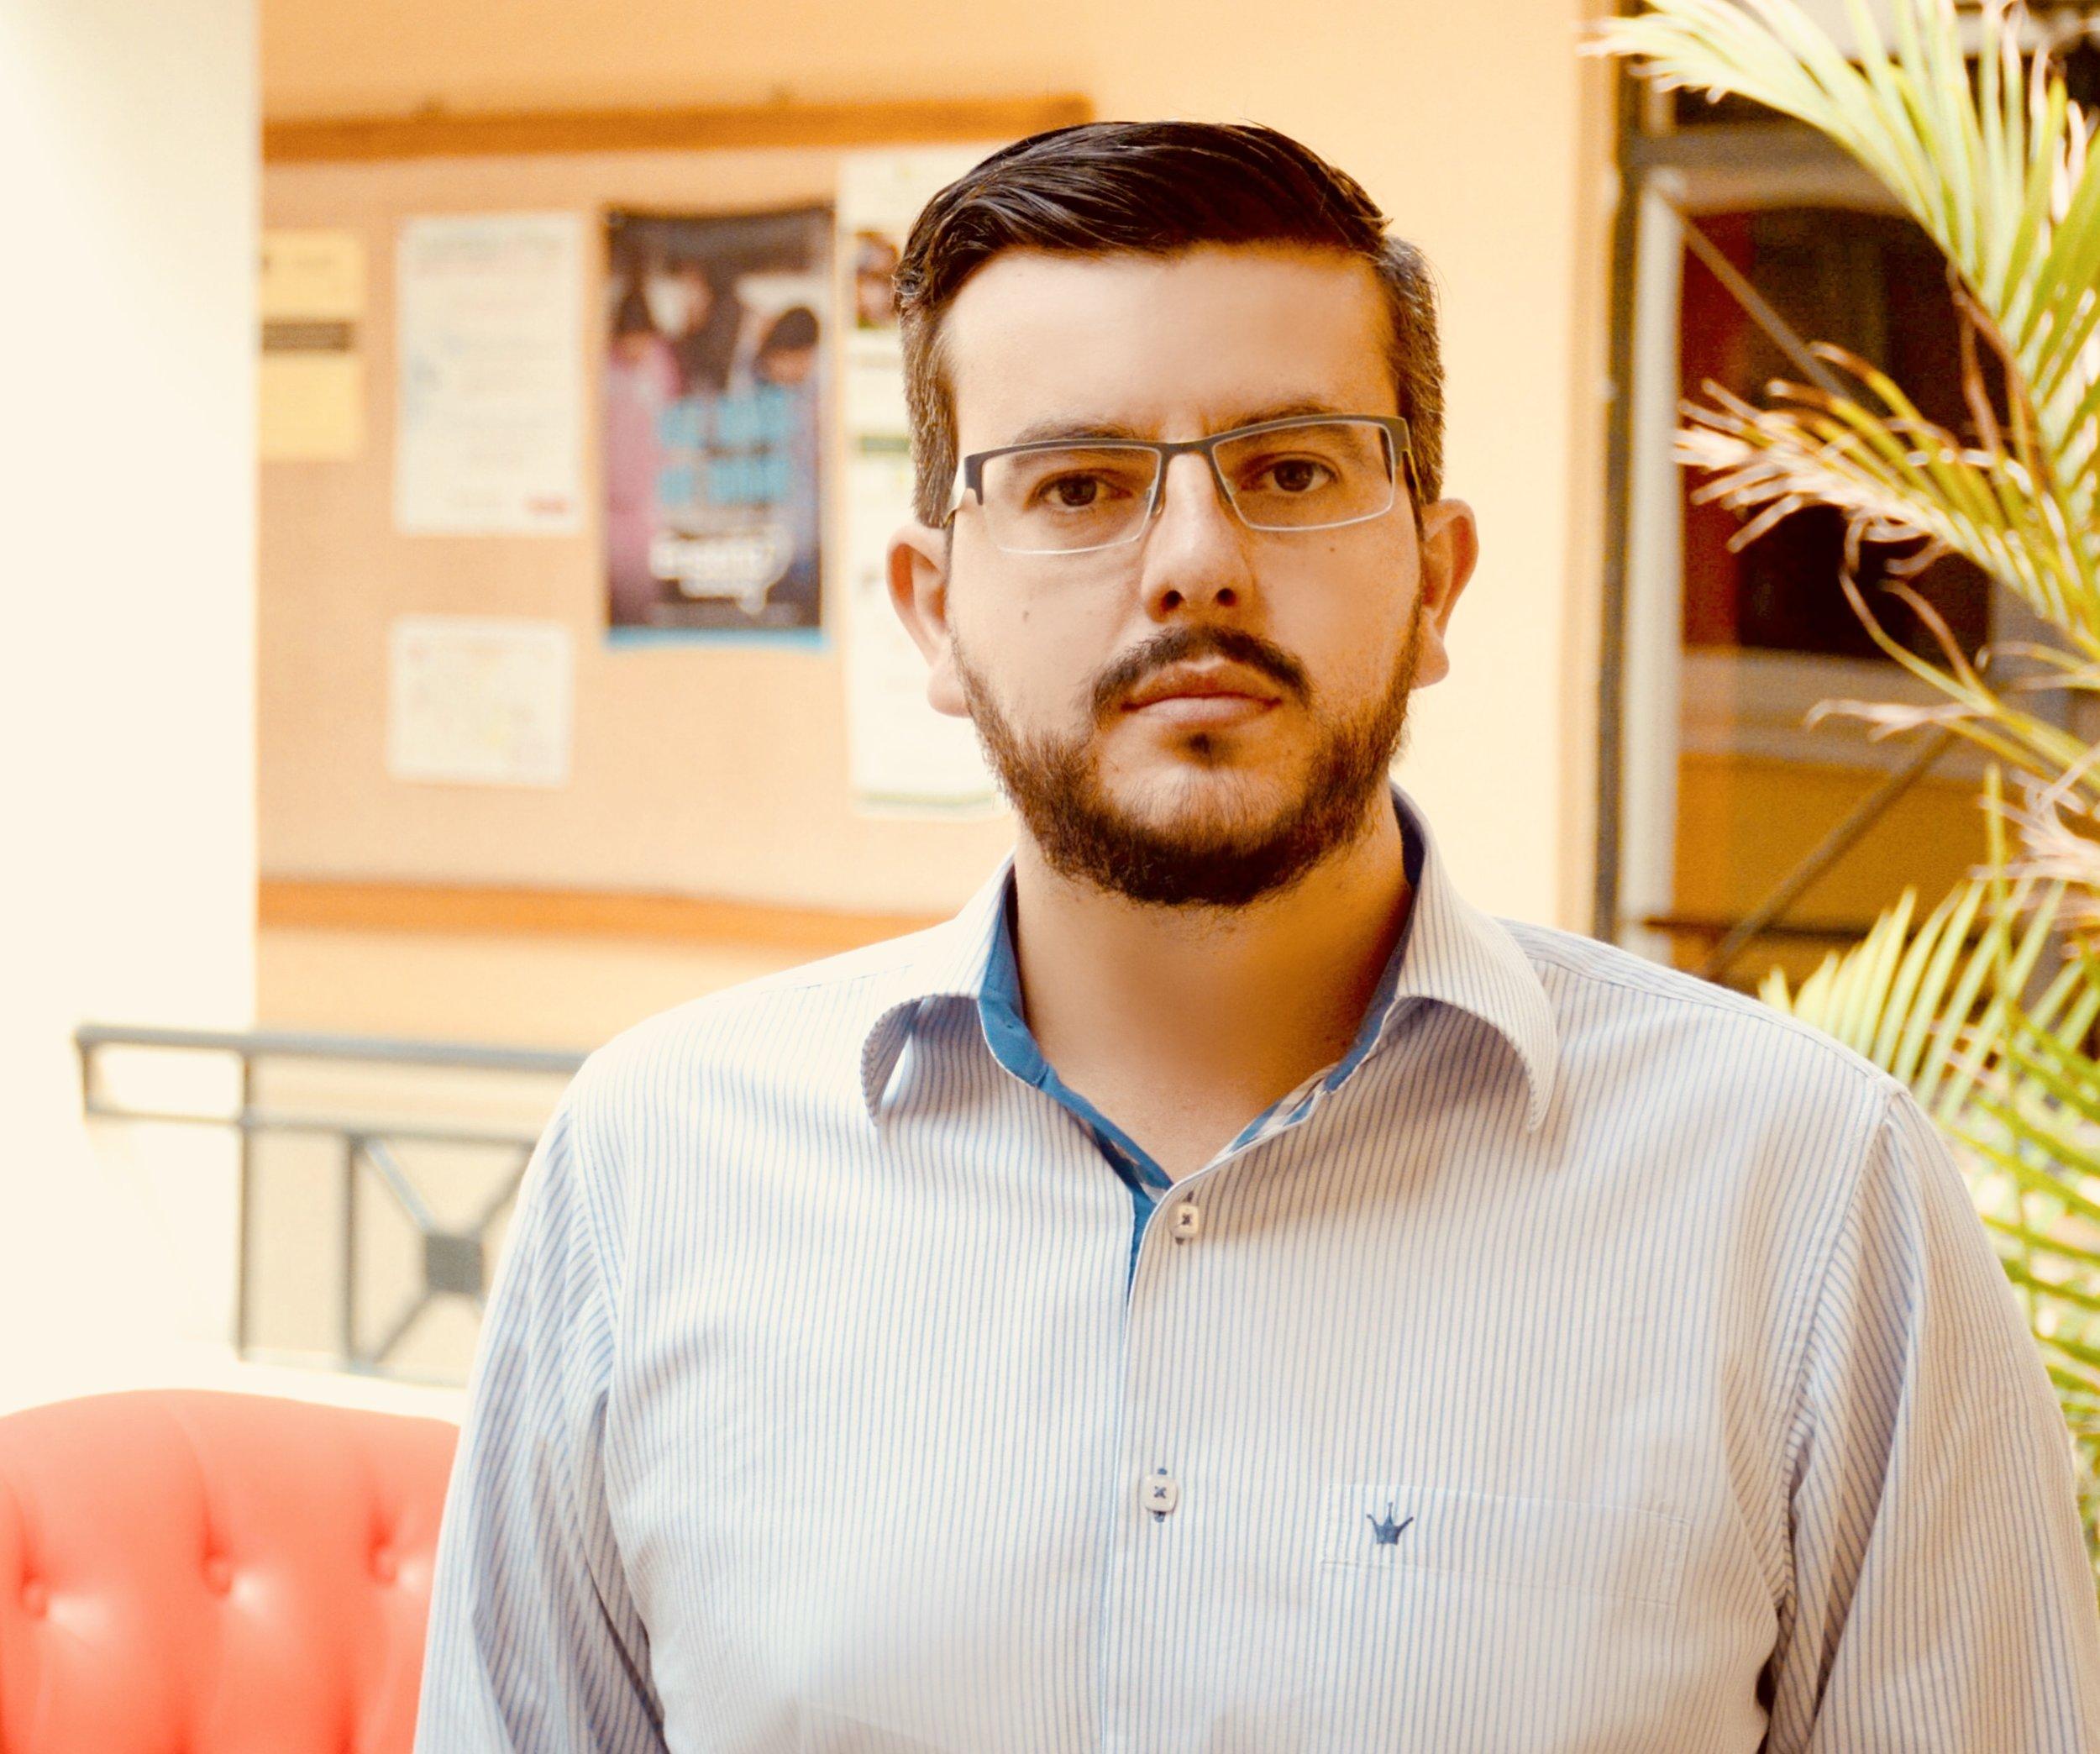 Paul Cardenas-Aldaz, MD, PhD, MSc    Fellowship Site: Universidad San Francisco de Quito, Peru U.S. Institution: University of California, Berkeley   Email